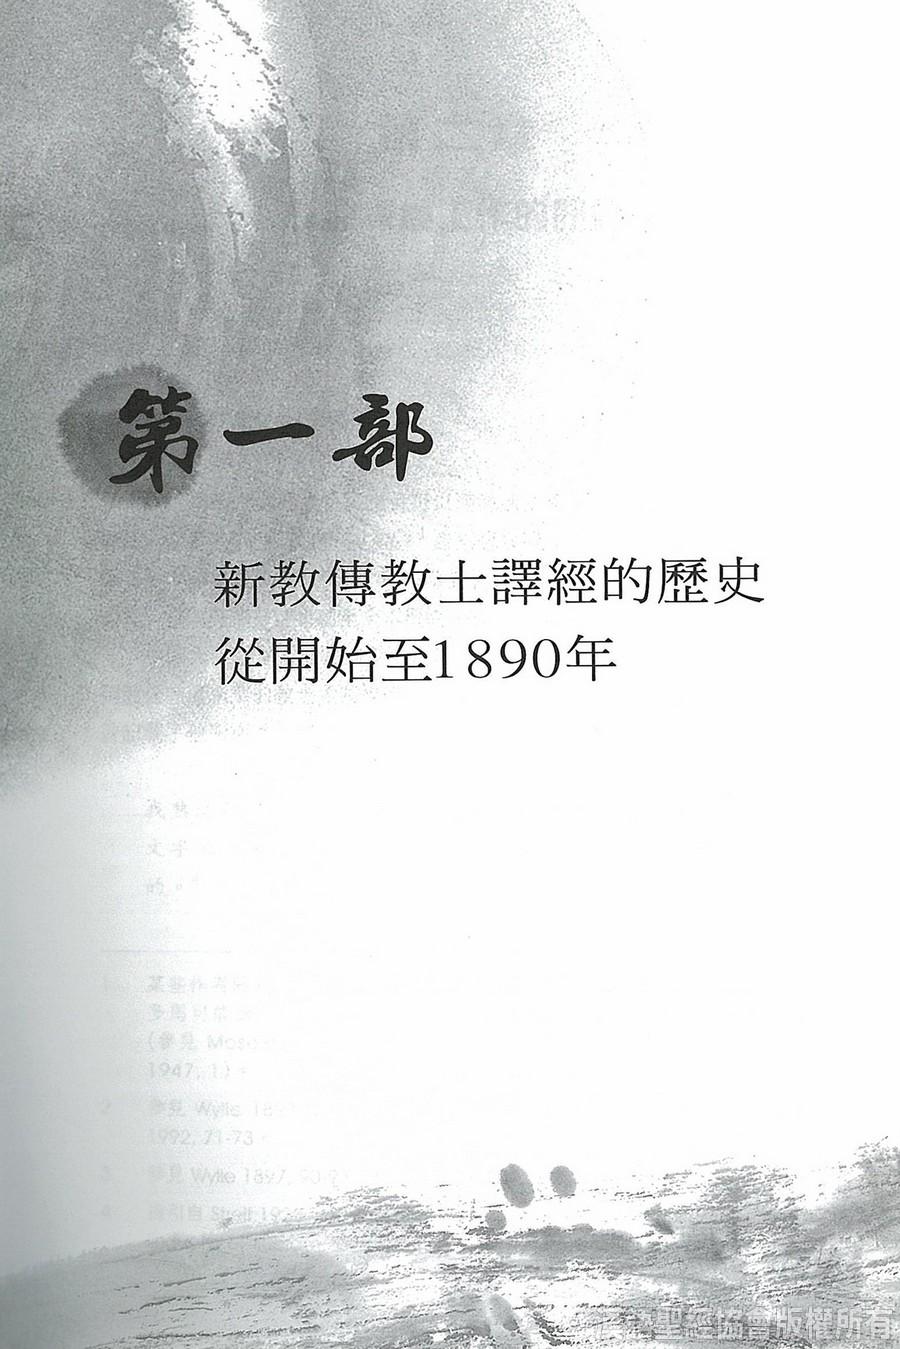 204-6